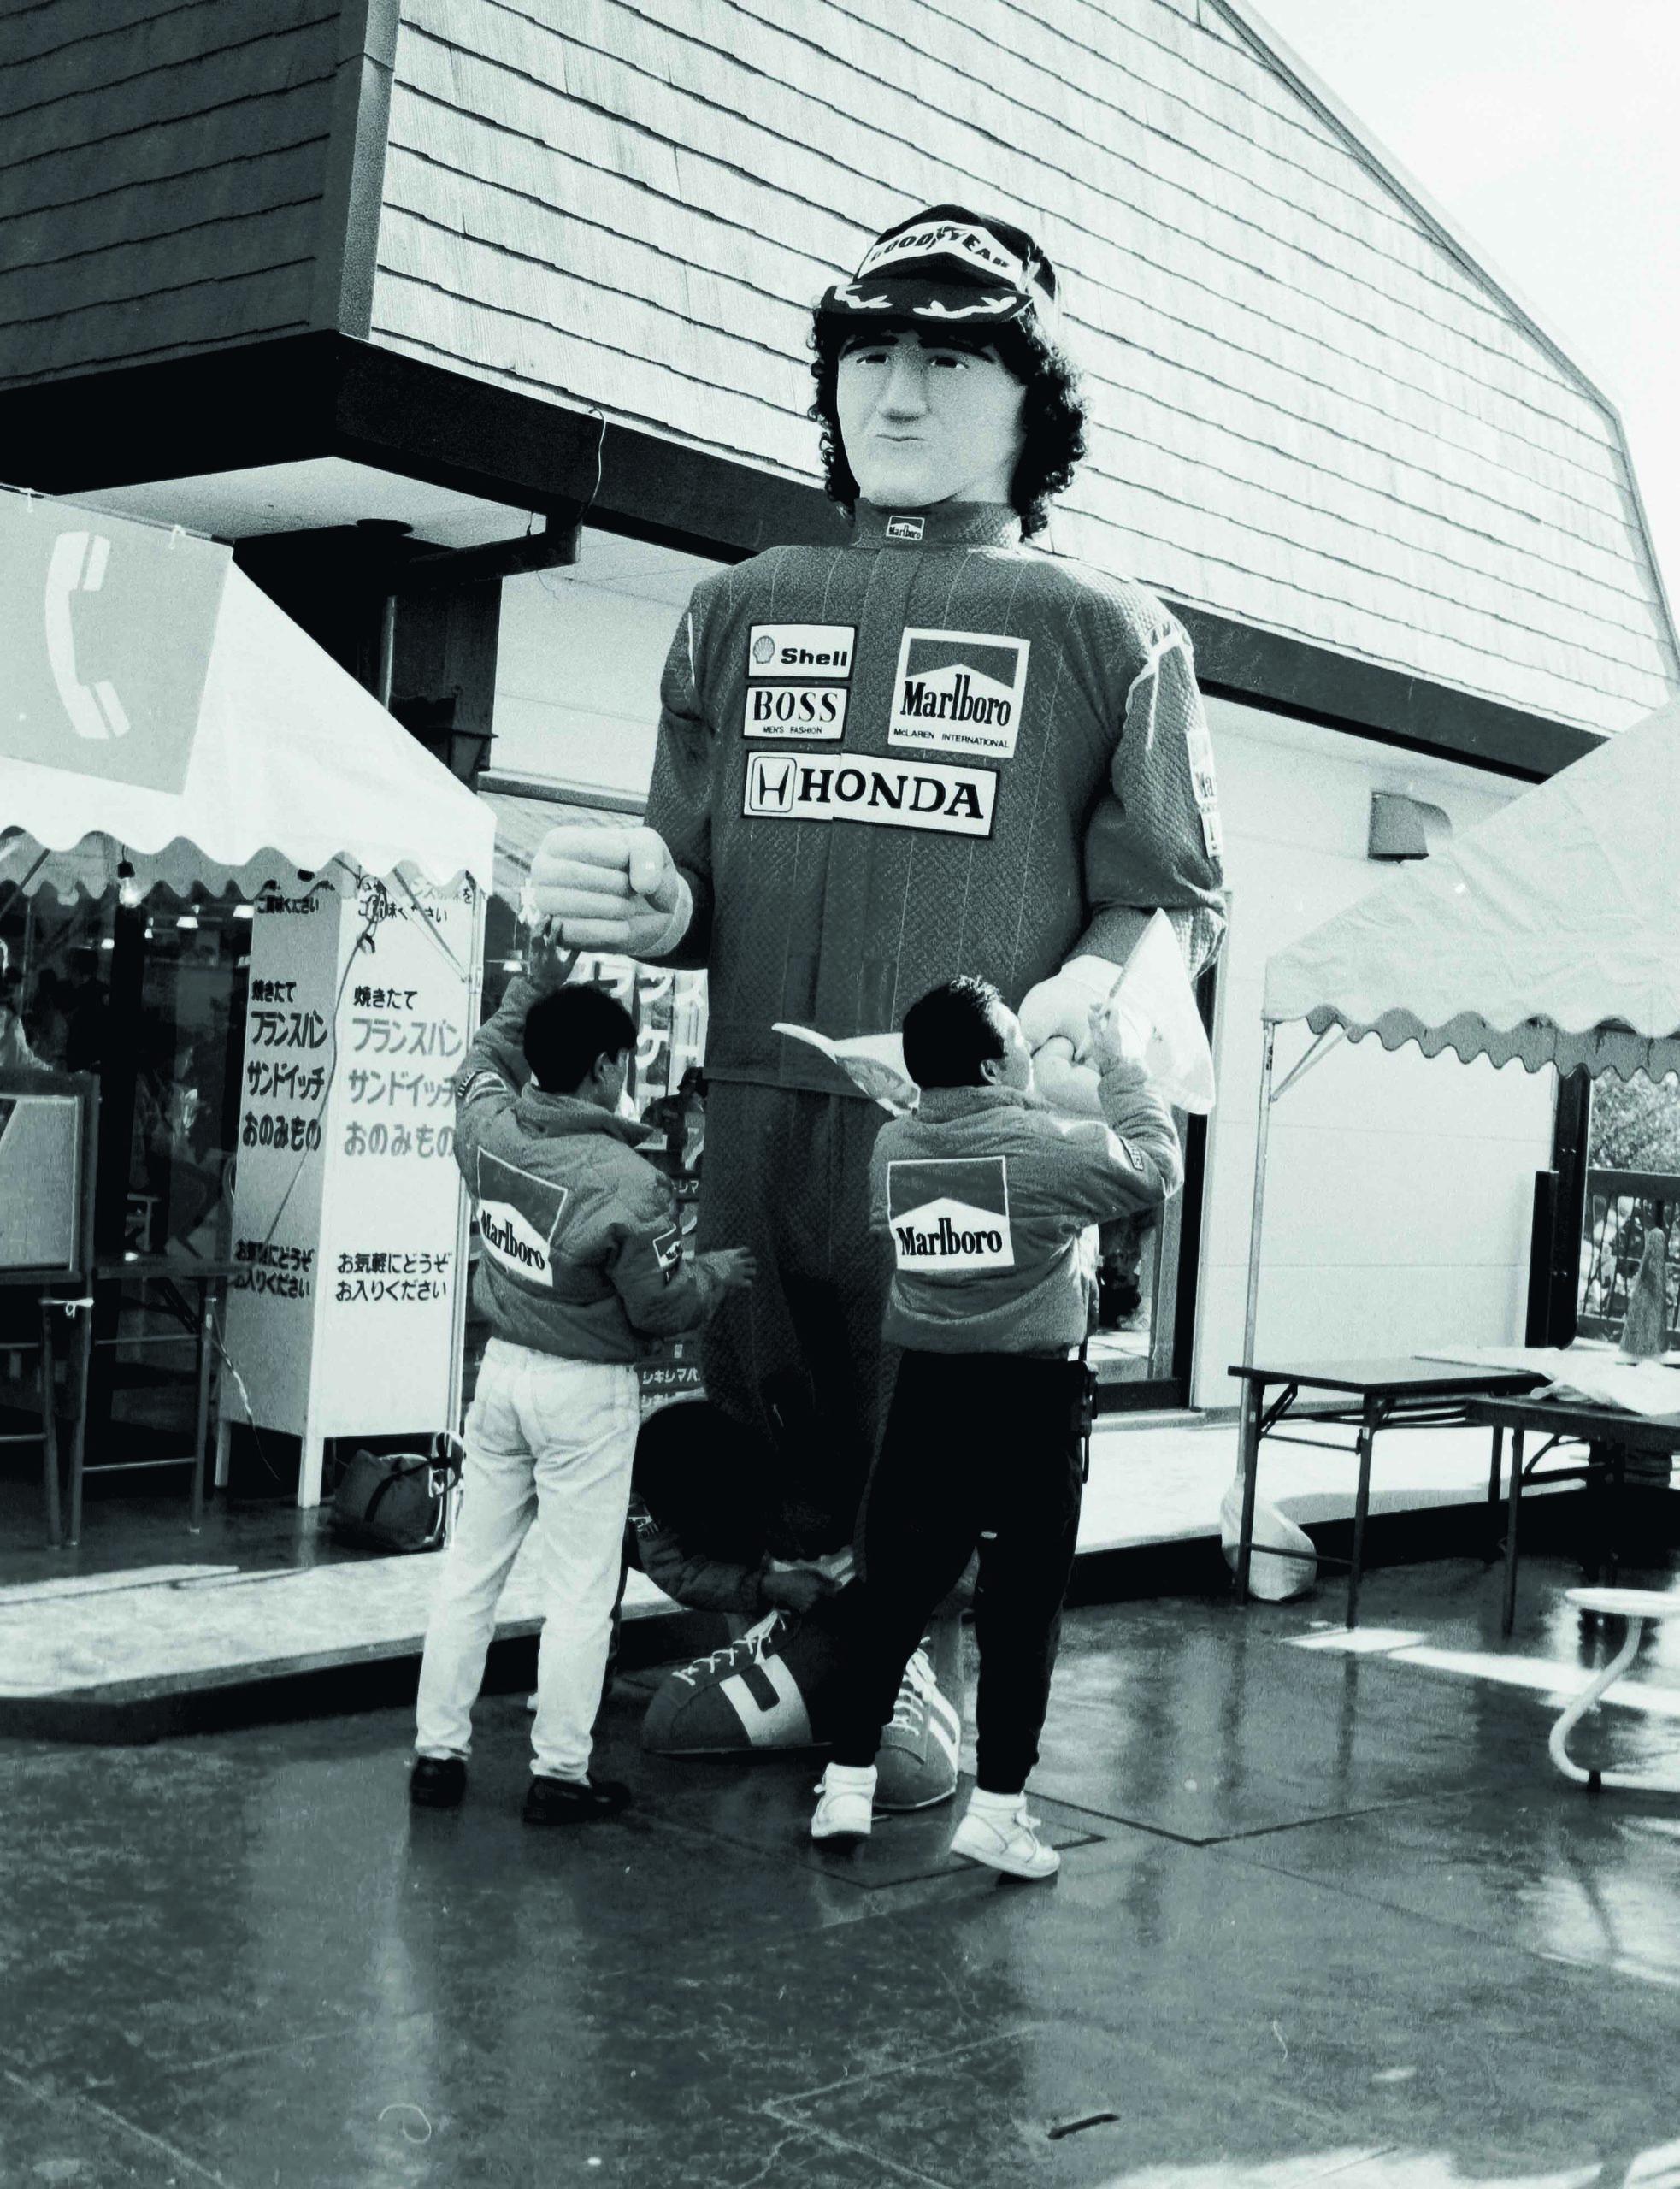 Giant-promotional-Alain-Prost-figure-at-Suzuka-1989